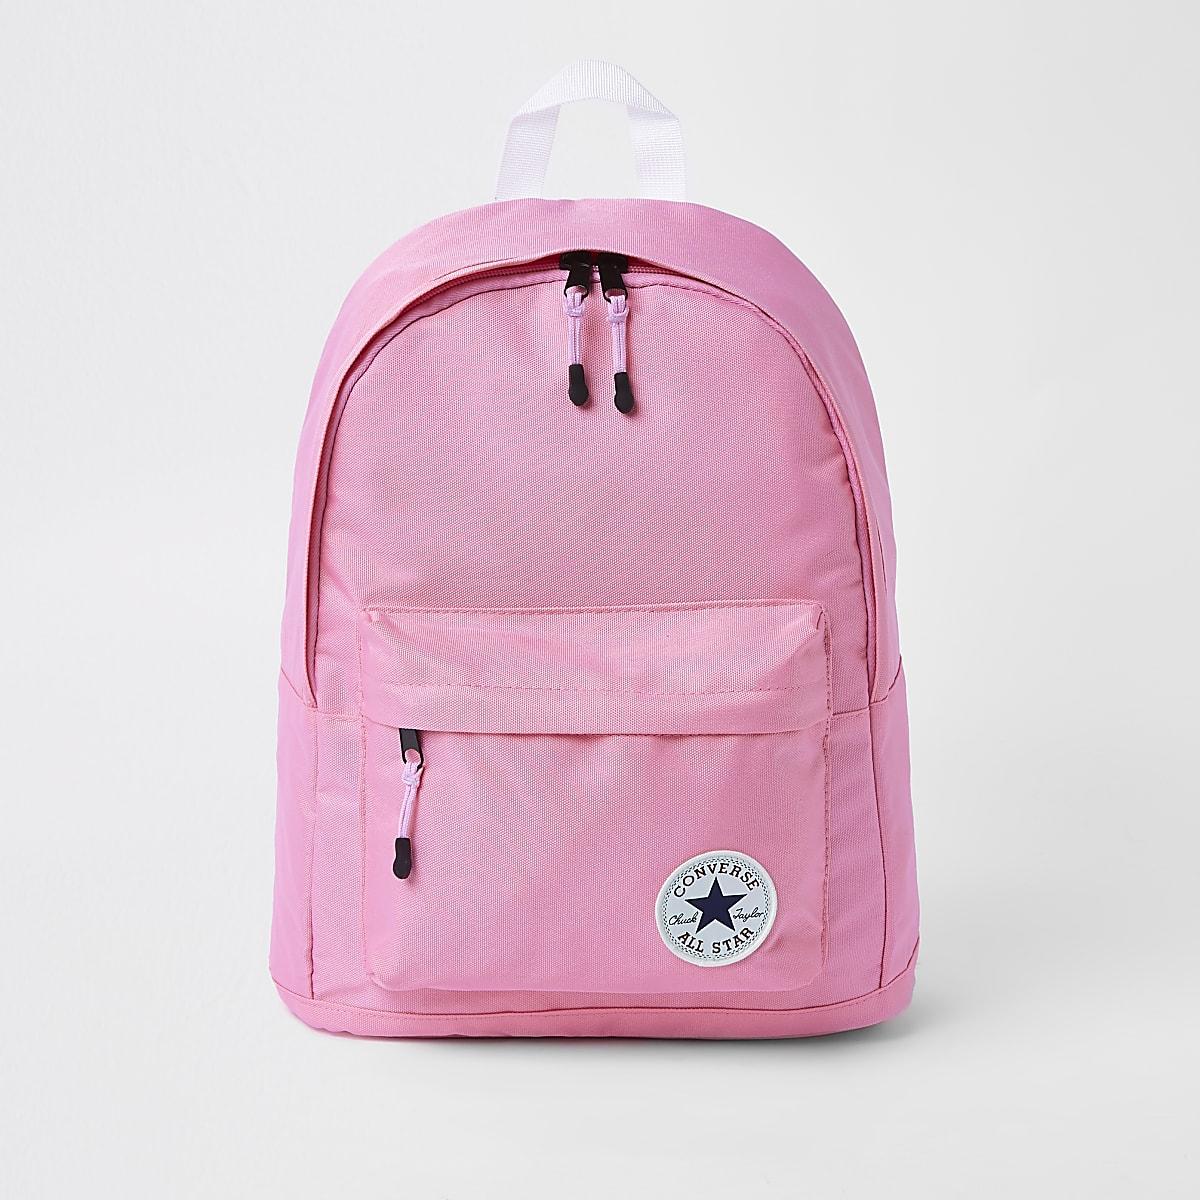 69be7e24acf621 Girls pink Converse backpack - Backpacks - Bags   Purses - girls